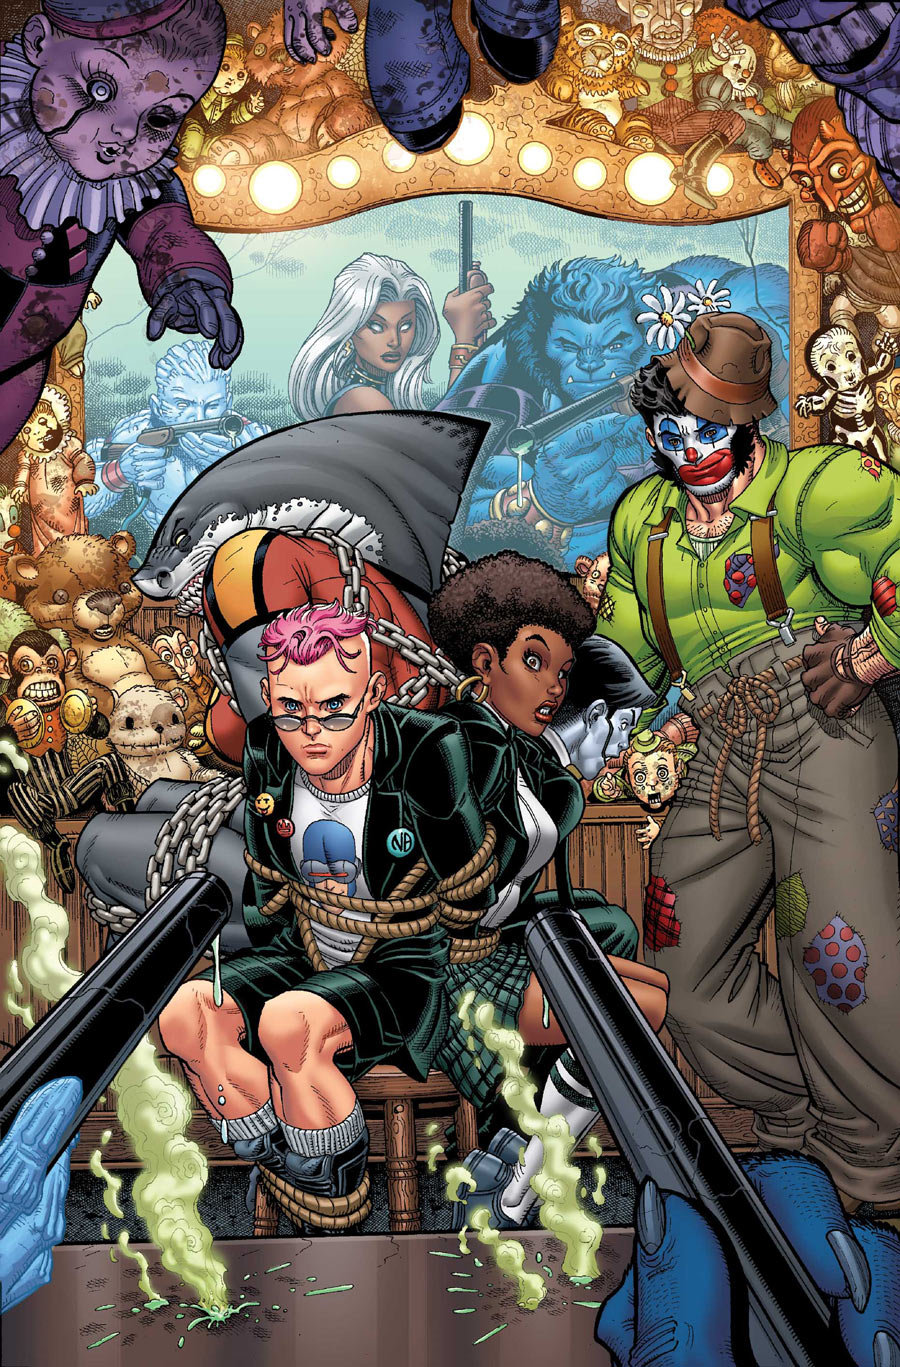 Nick Bradshaw Wolverine and the x-men